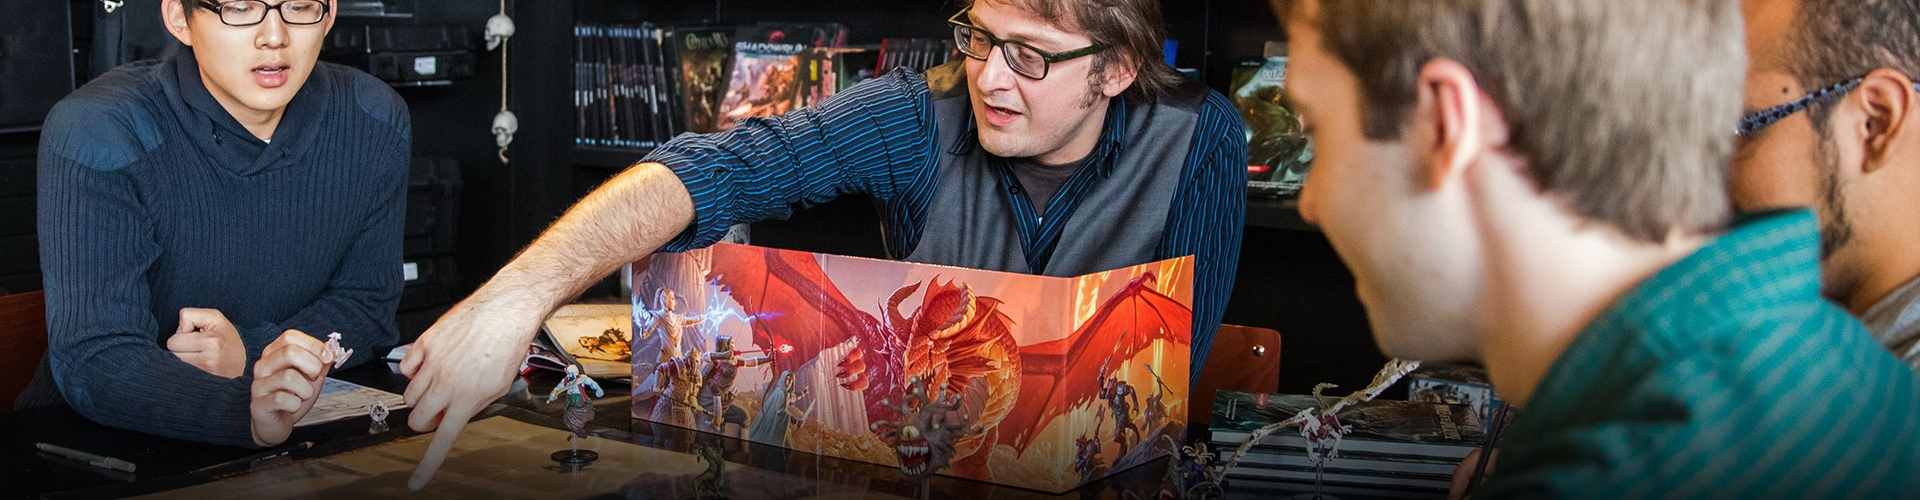 Dungeons & Dragons at Origins 2016